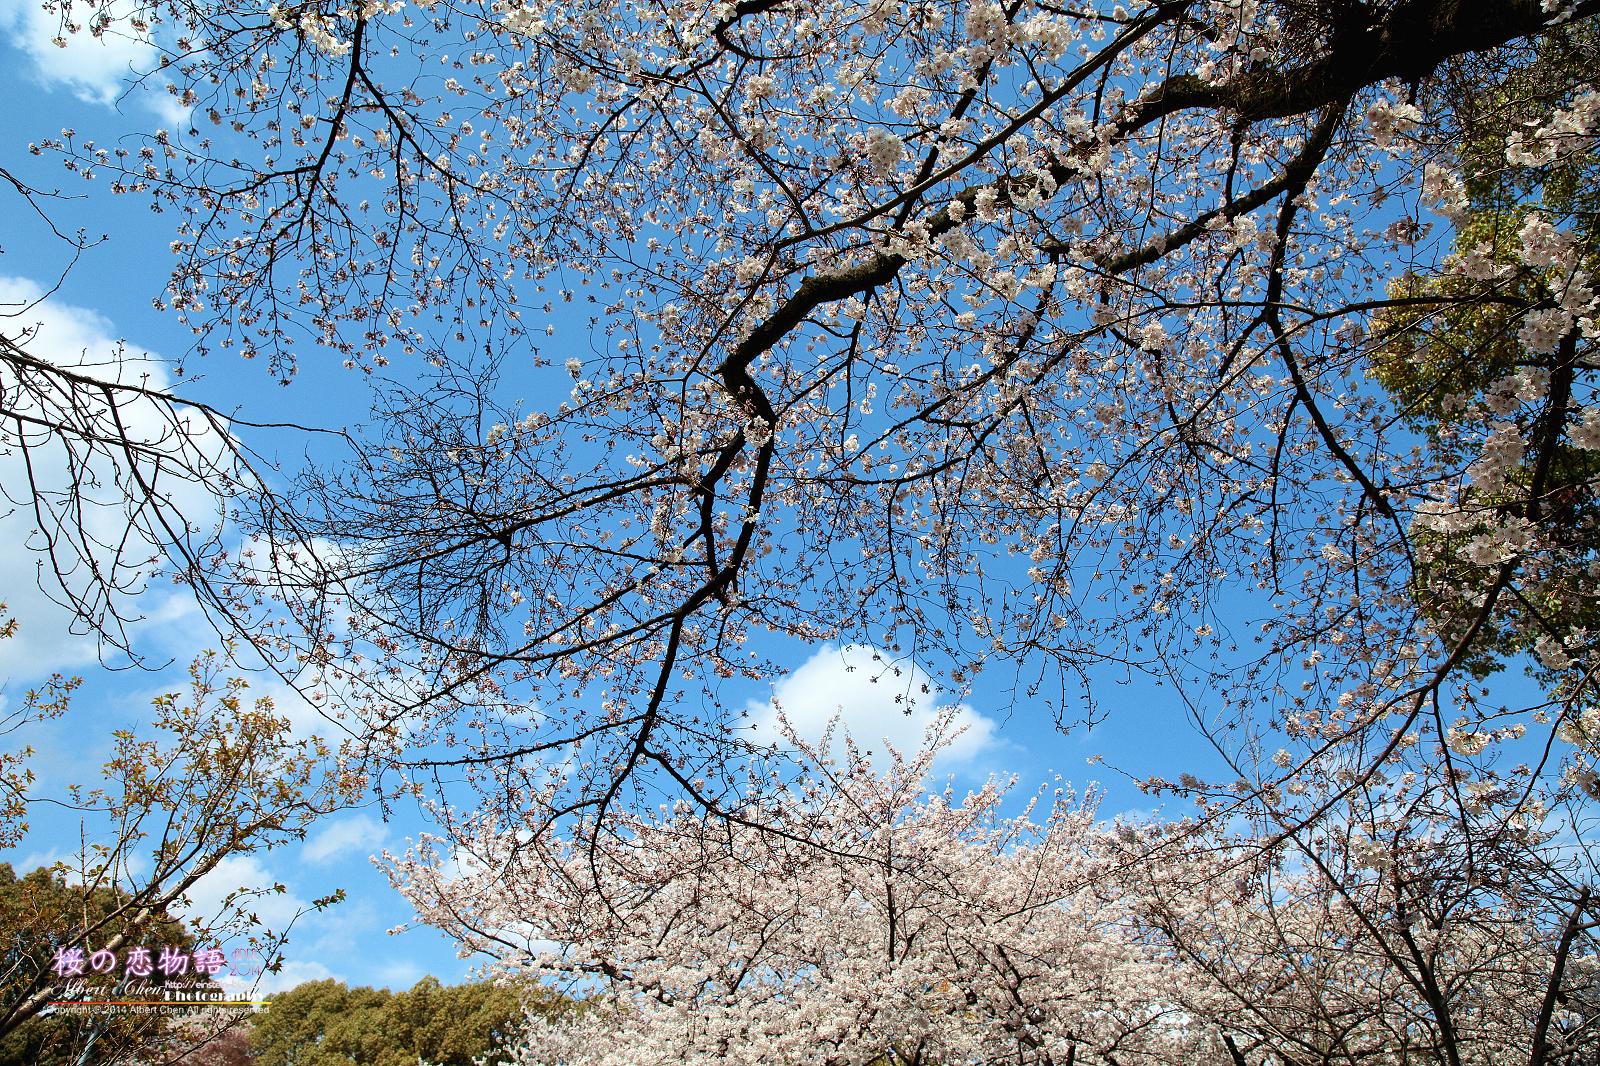 2014-04-02 13.54.06IMG_2514